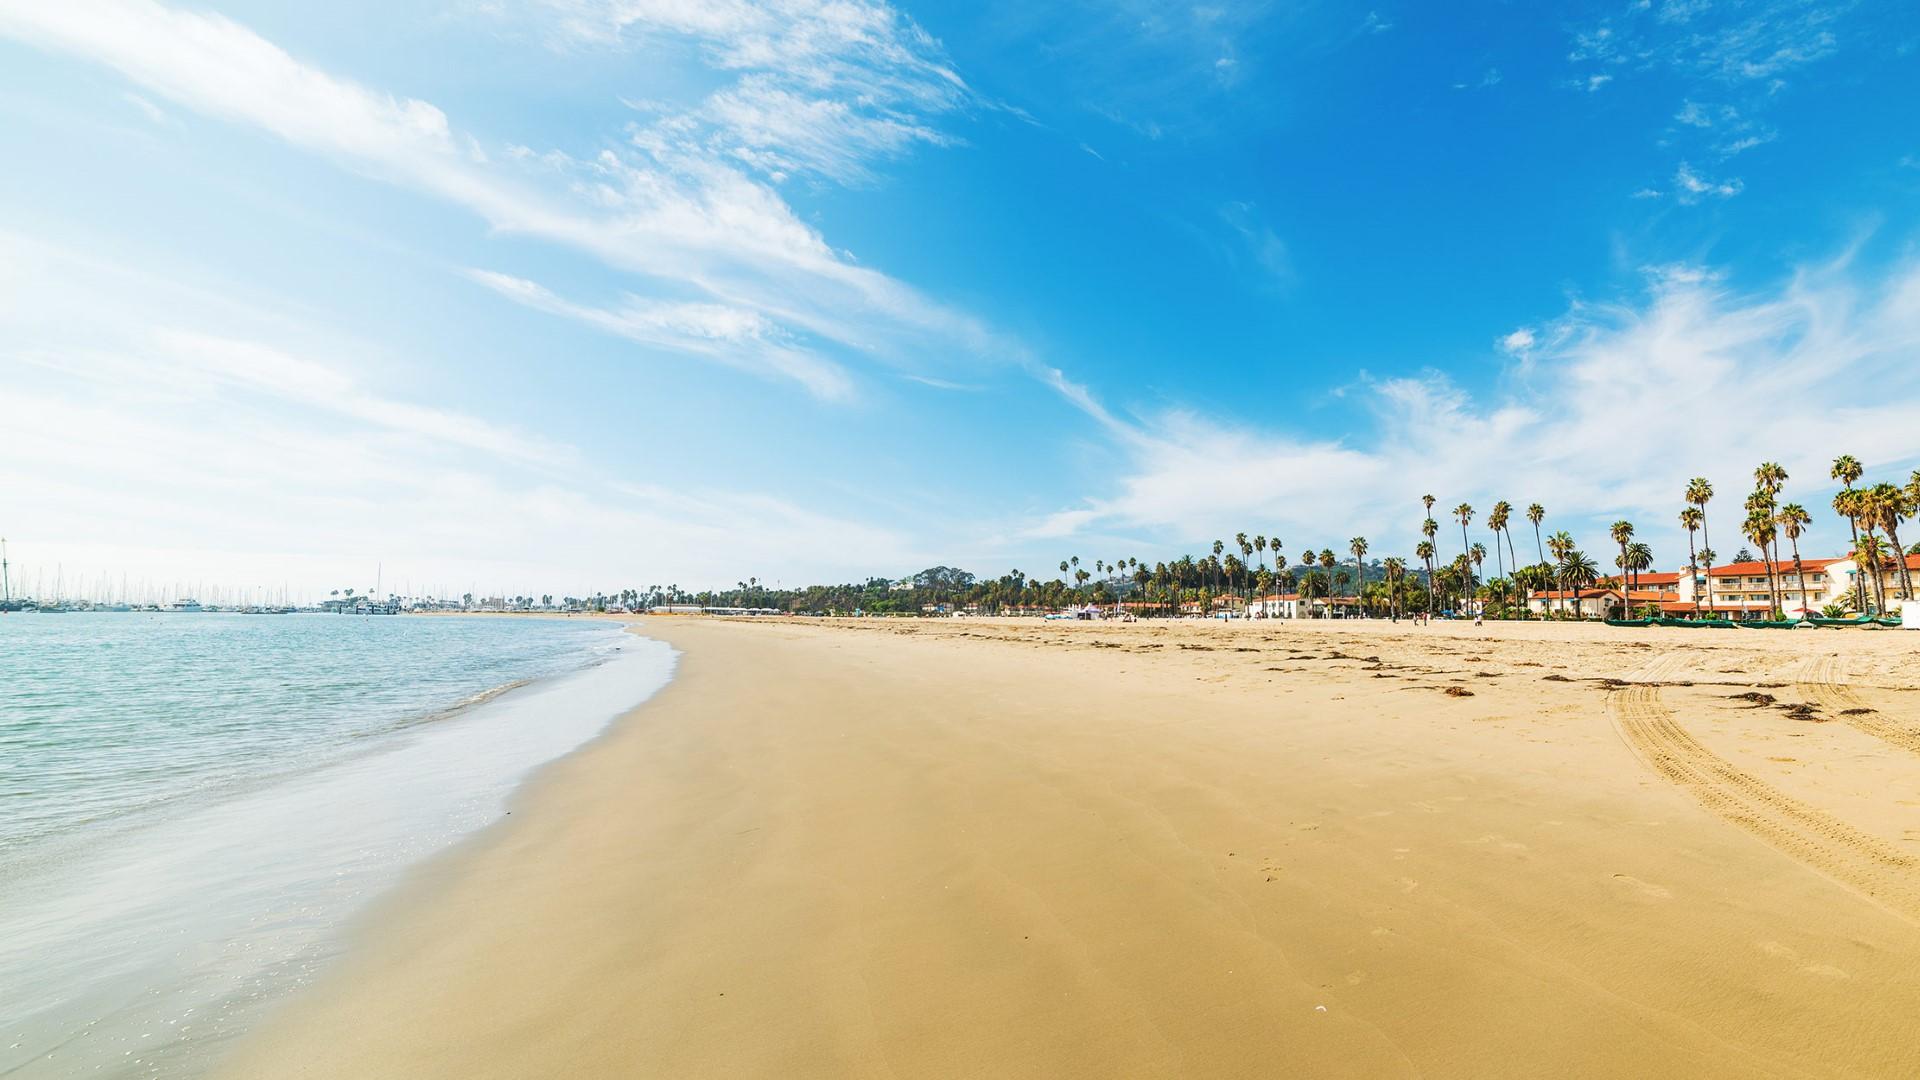 day-3_beaches_santa-barbara-california-usa-hgr-141982-photo_shutterstock